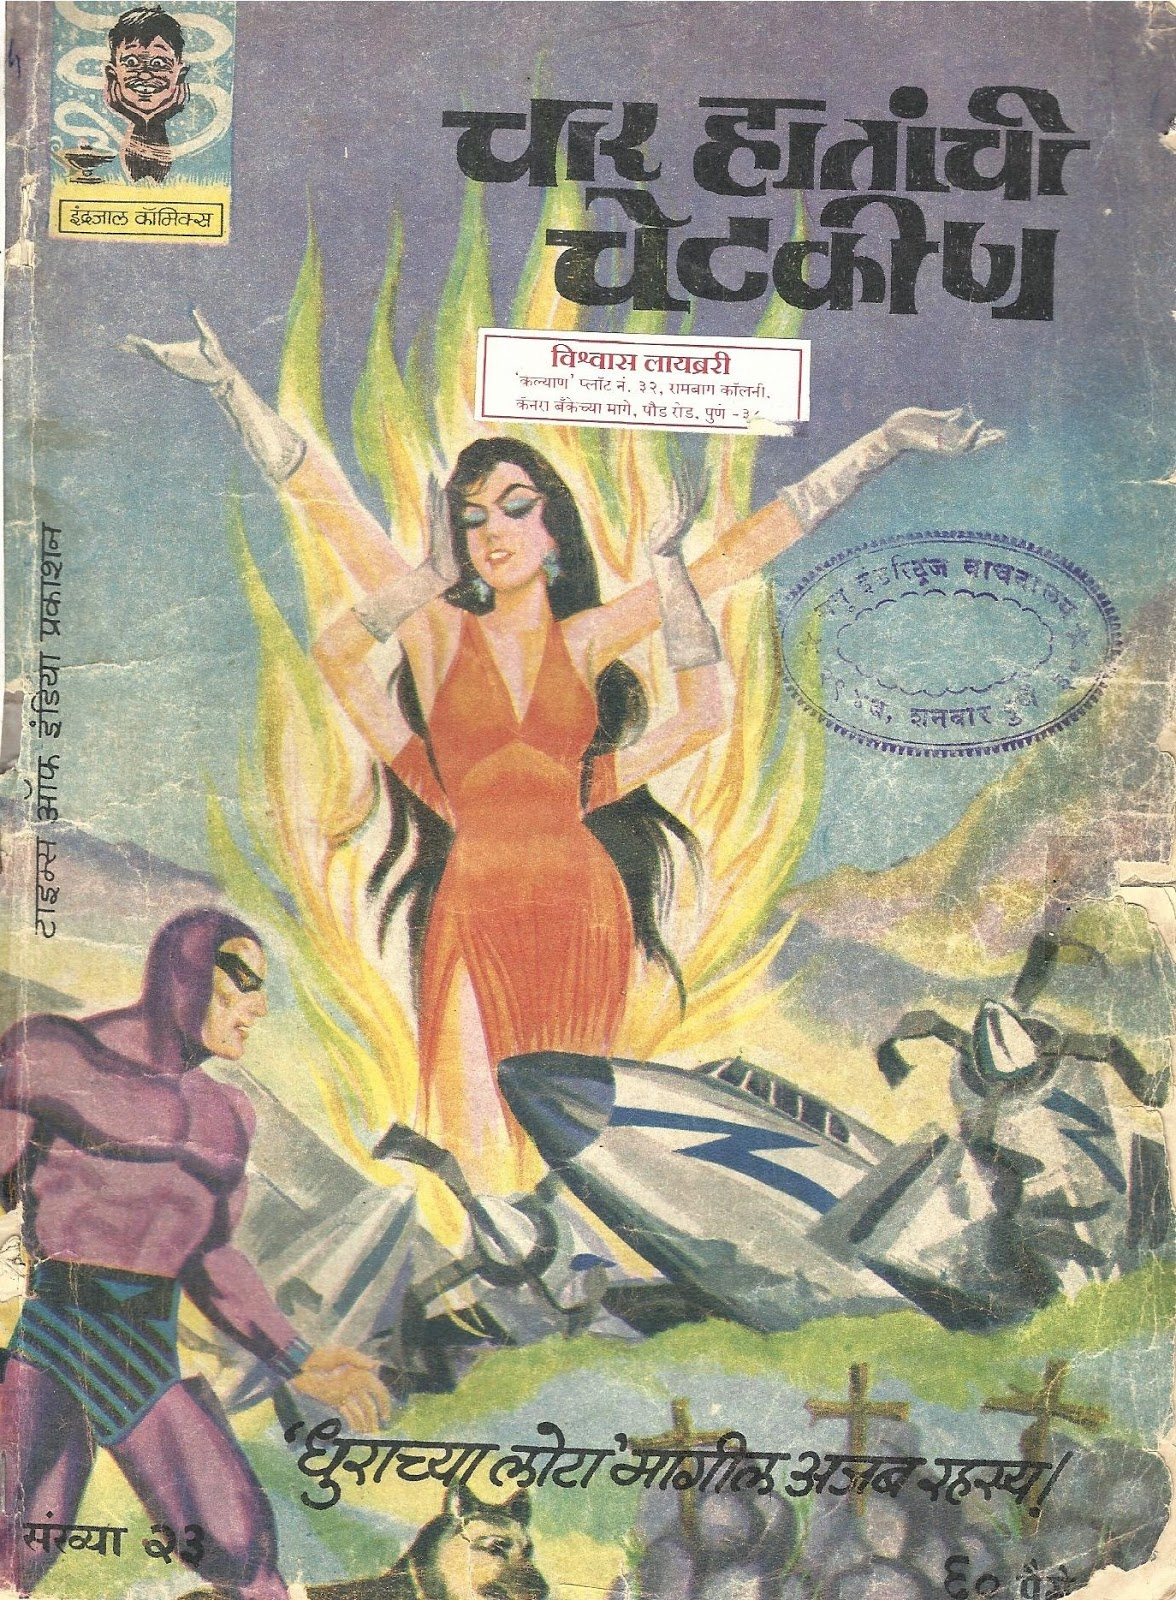 The Lost WORLD: Comic #106 - Marathi Indrajal No 23(January